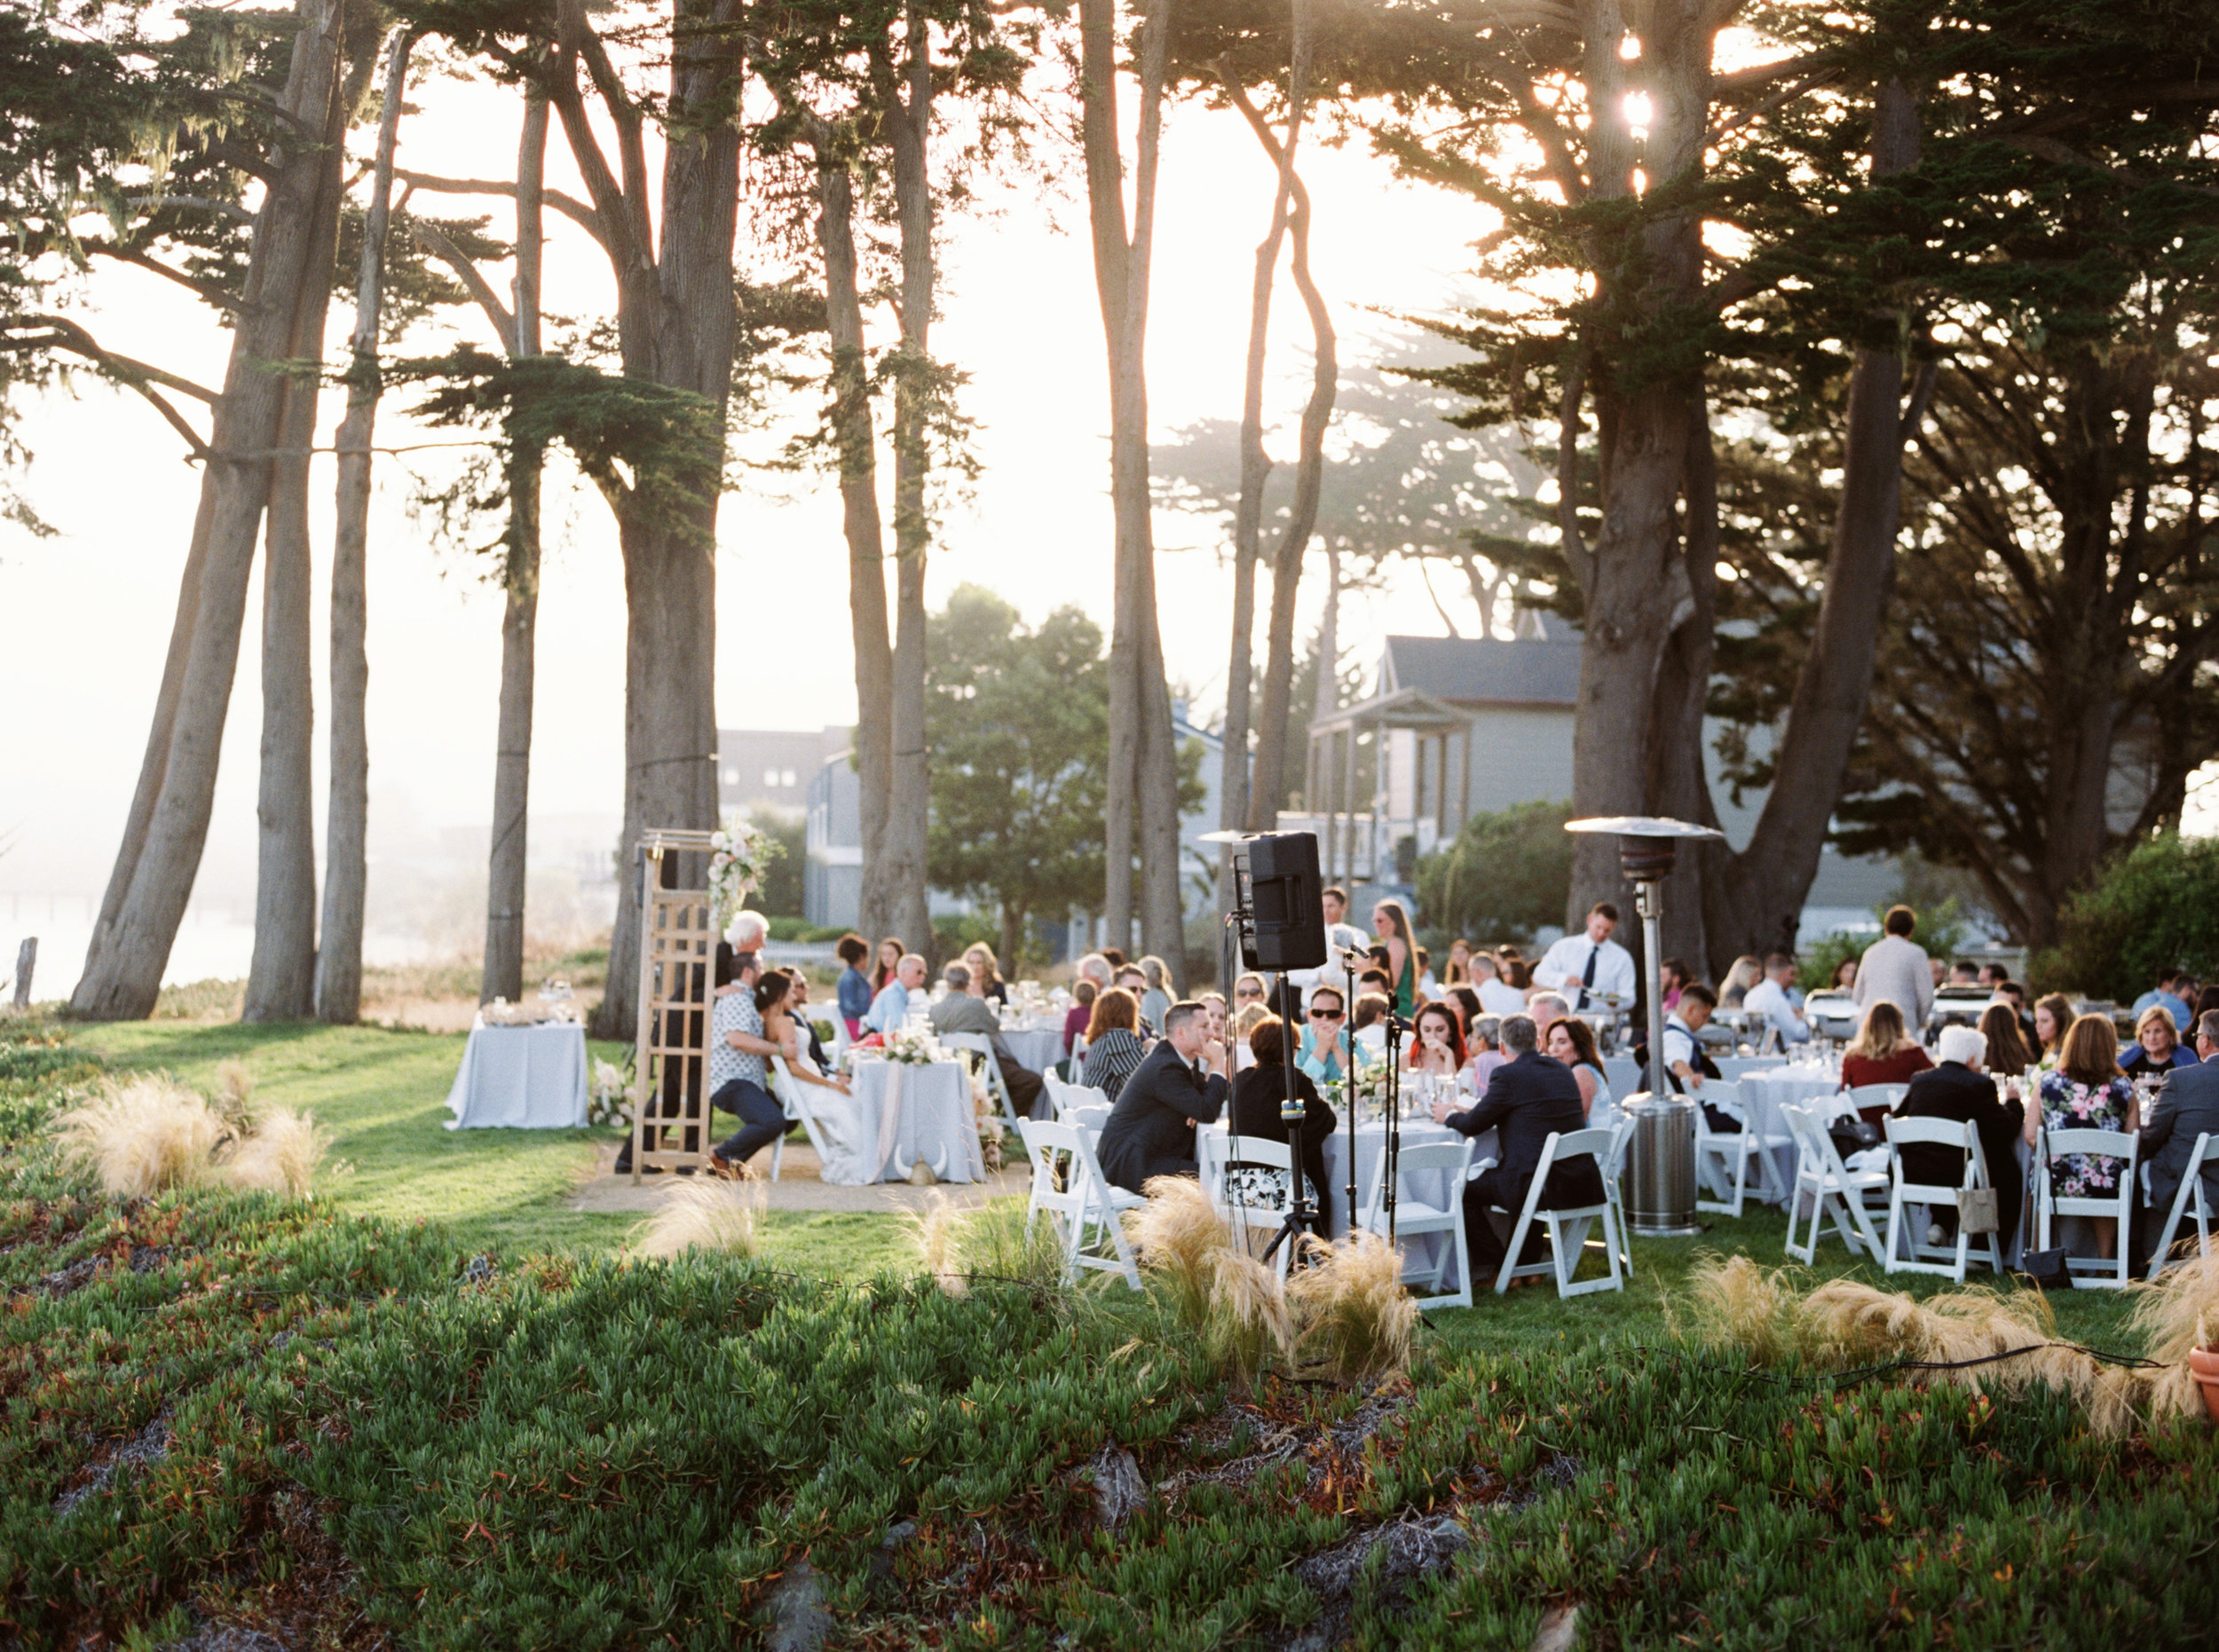 trynhphoto_socal_sf_halfmoon_bay_wedding_photographer_JA-274.jpg